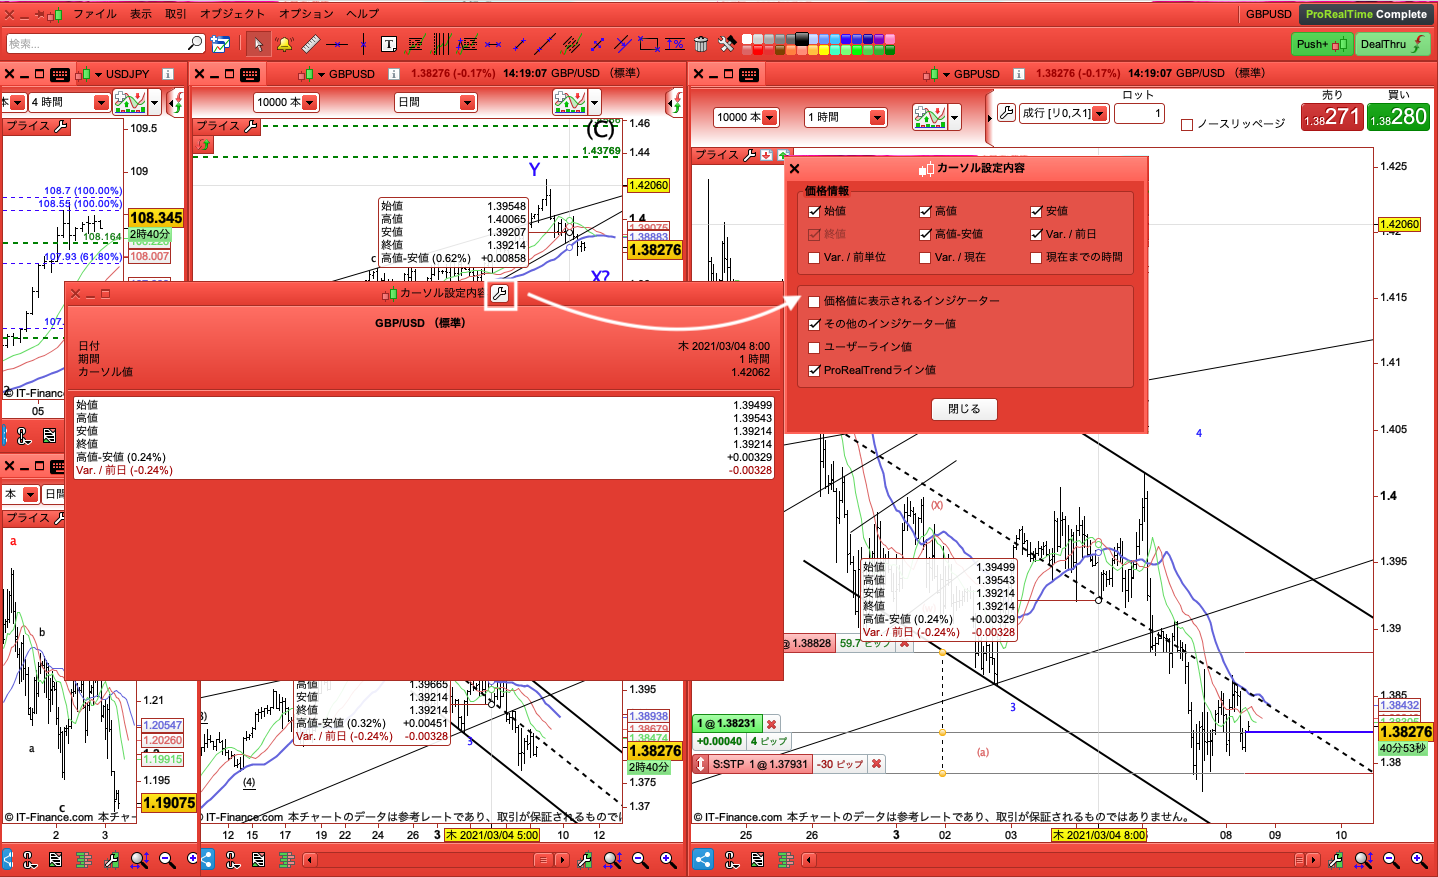 IG証券|ProRealTime|チャート|カーソル設定内容